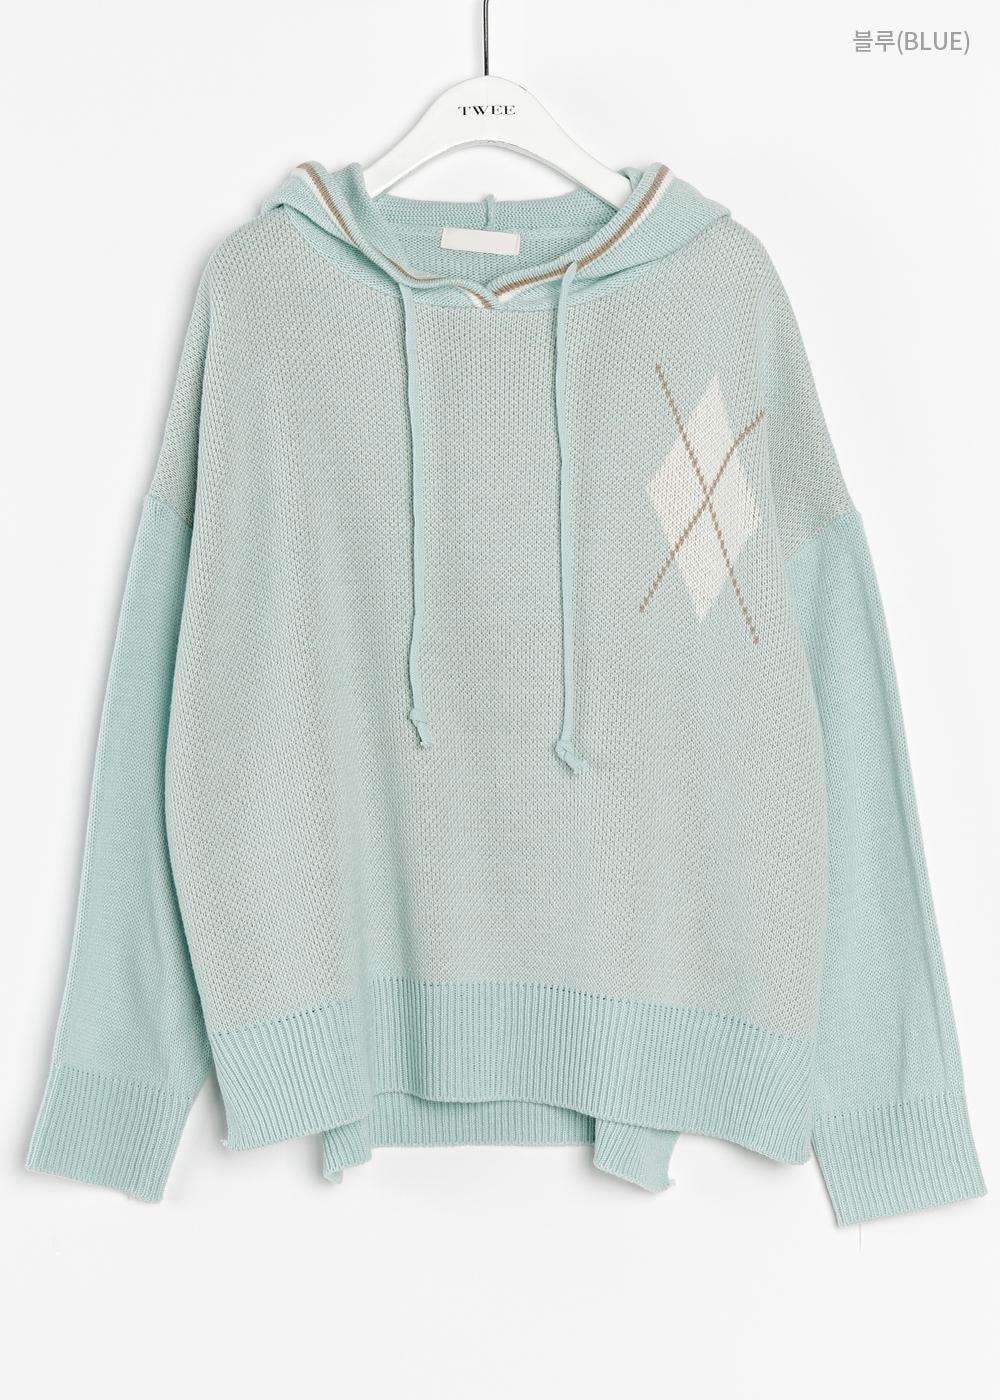 Argyle hooded knit